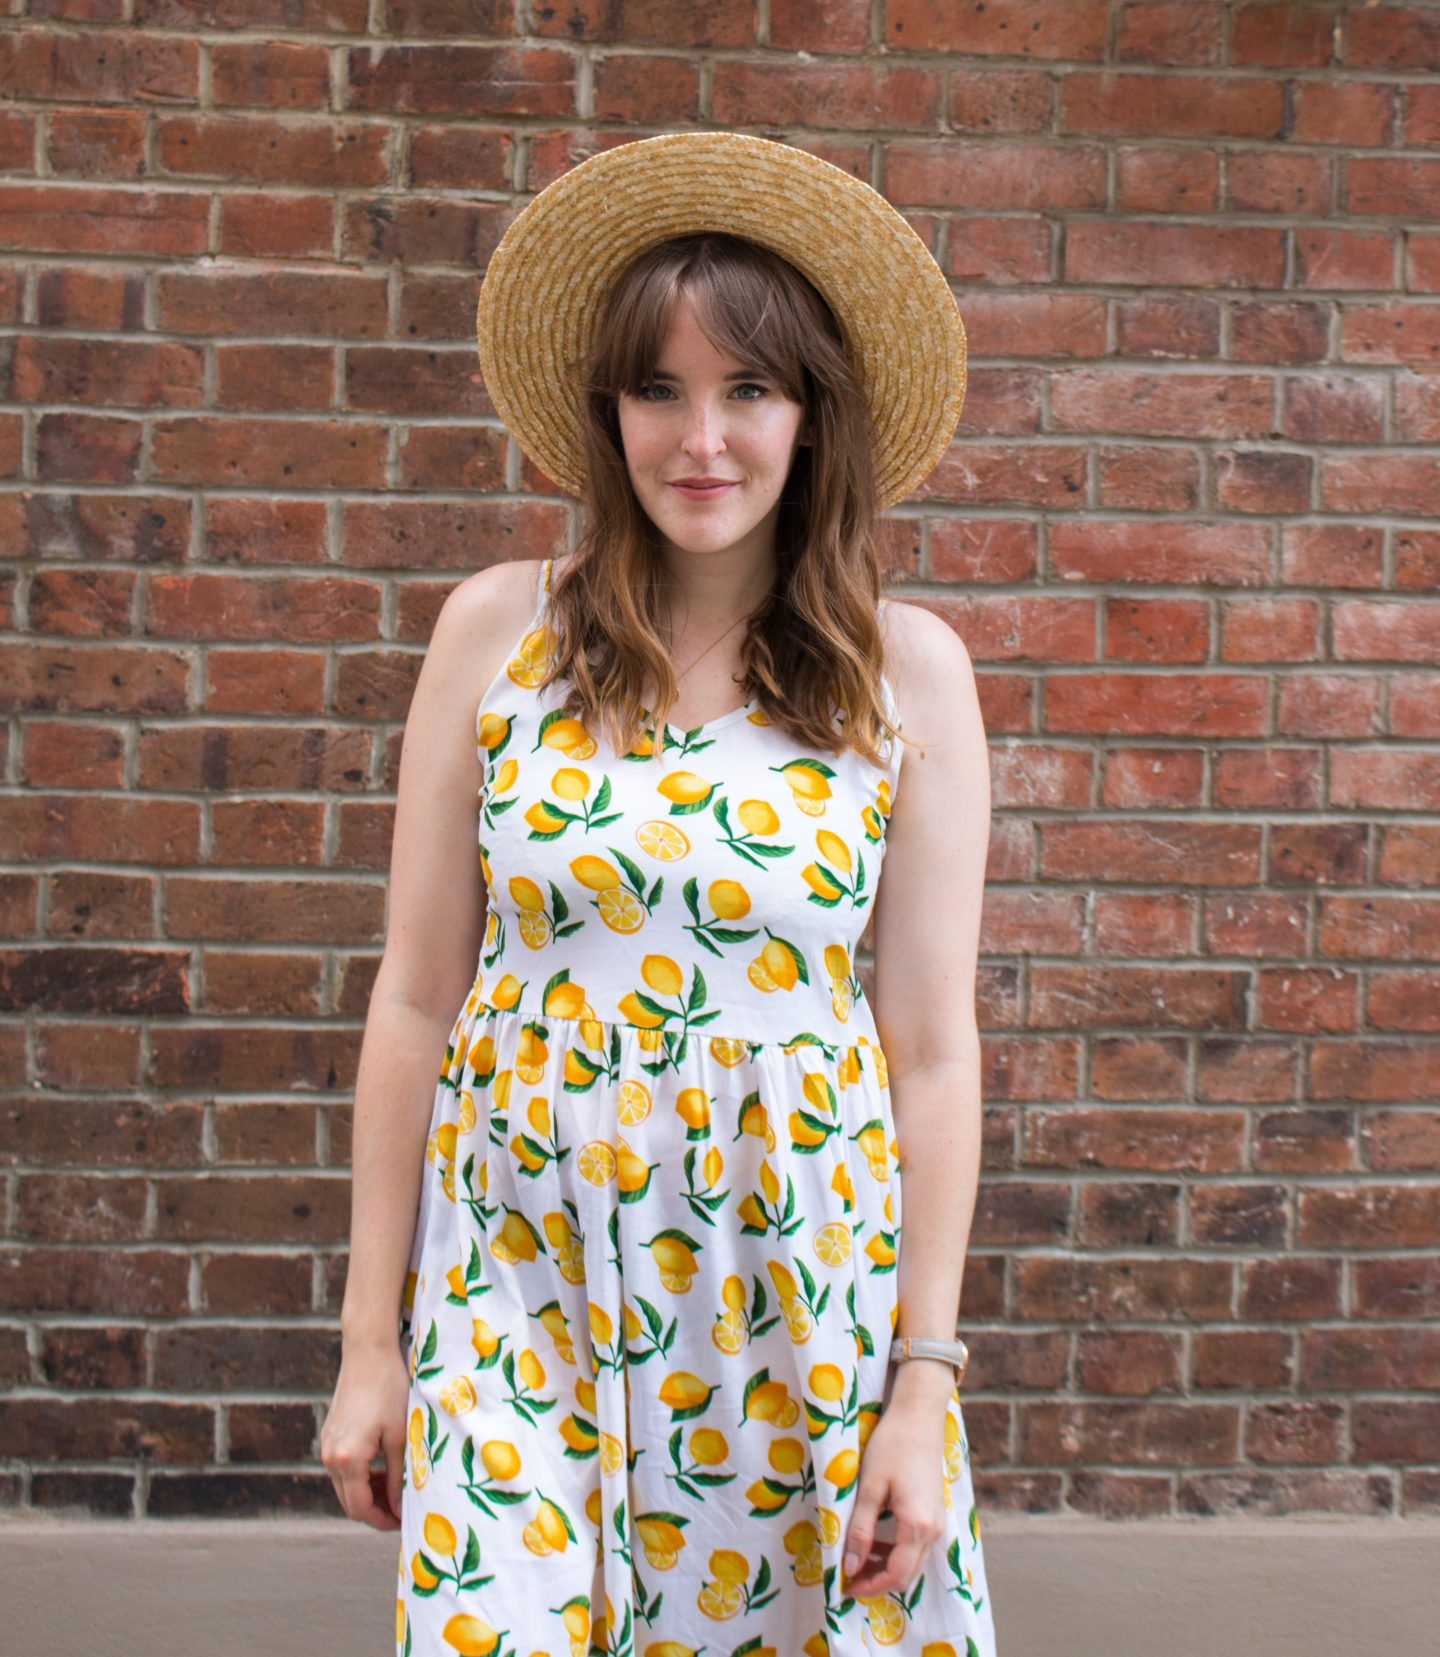 Lemon dress and straw hat